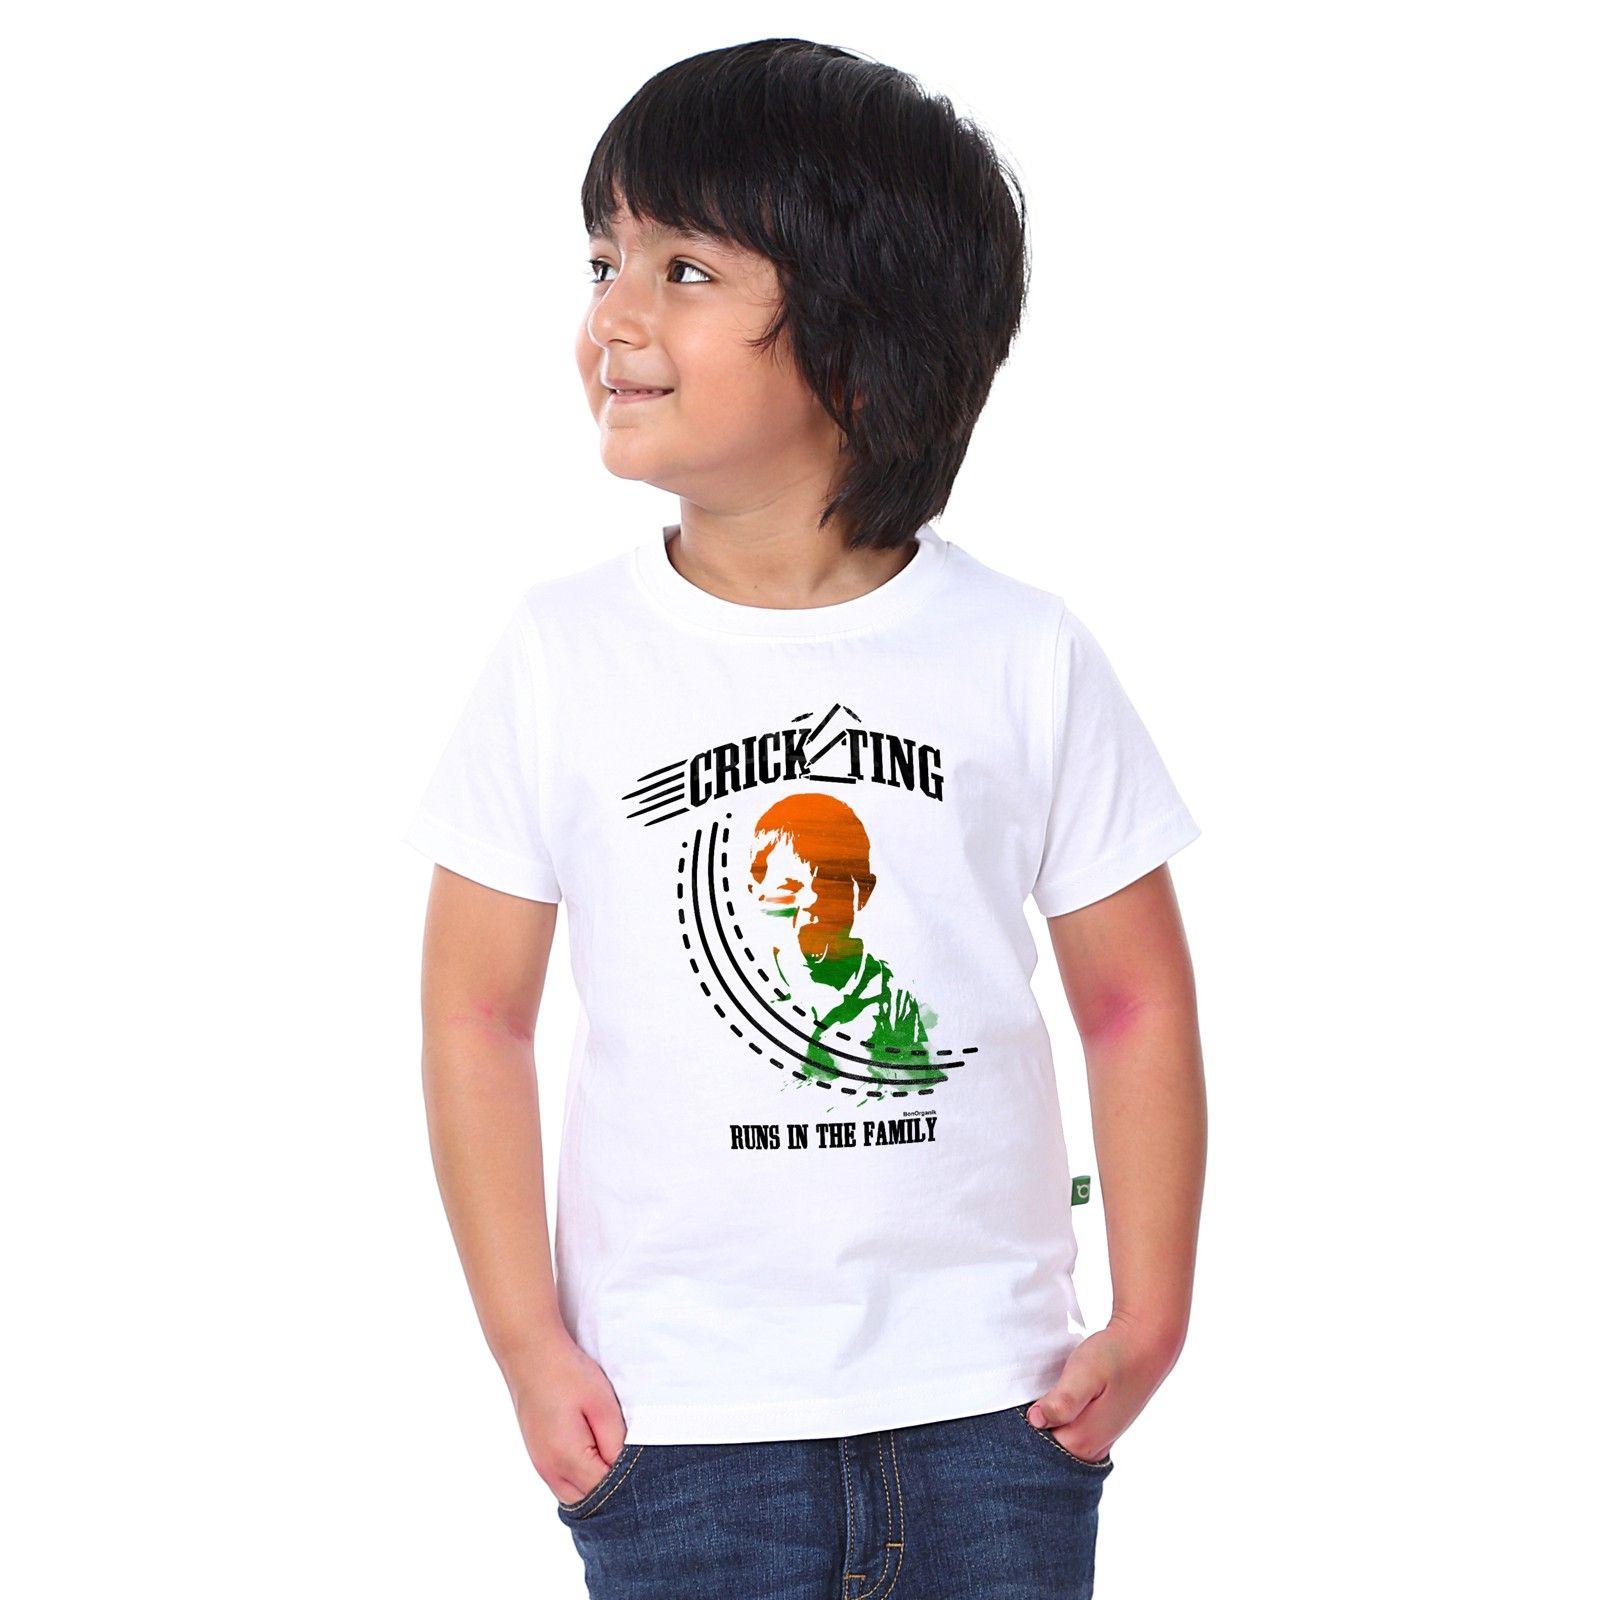 Boy's Cricketing Print White T-shirt - BonOrganik